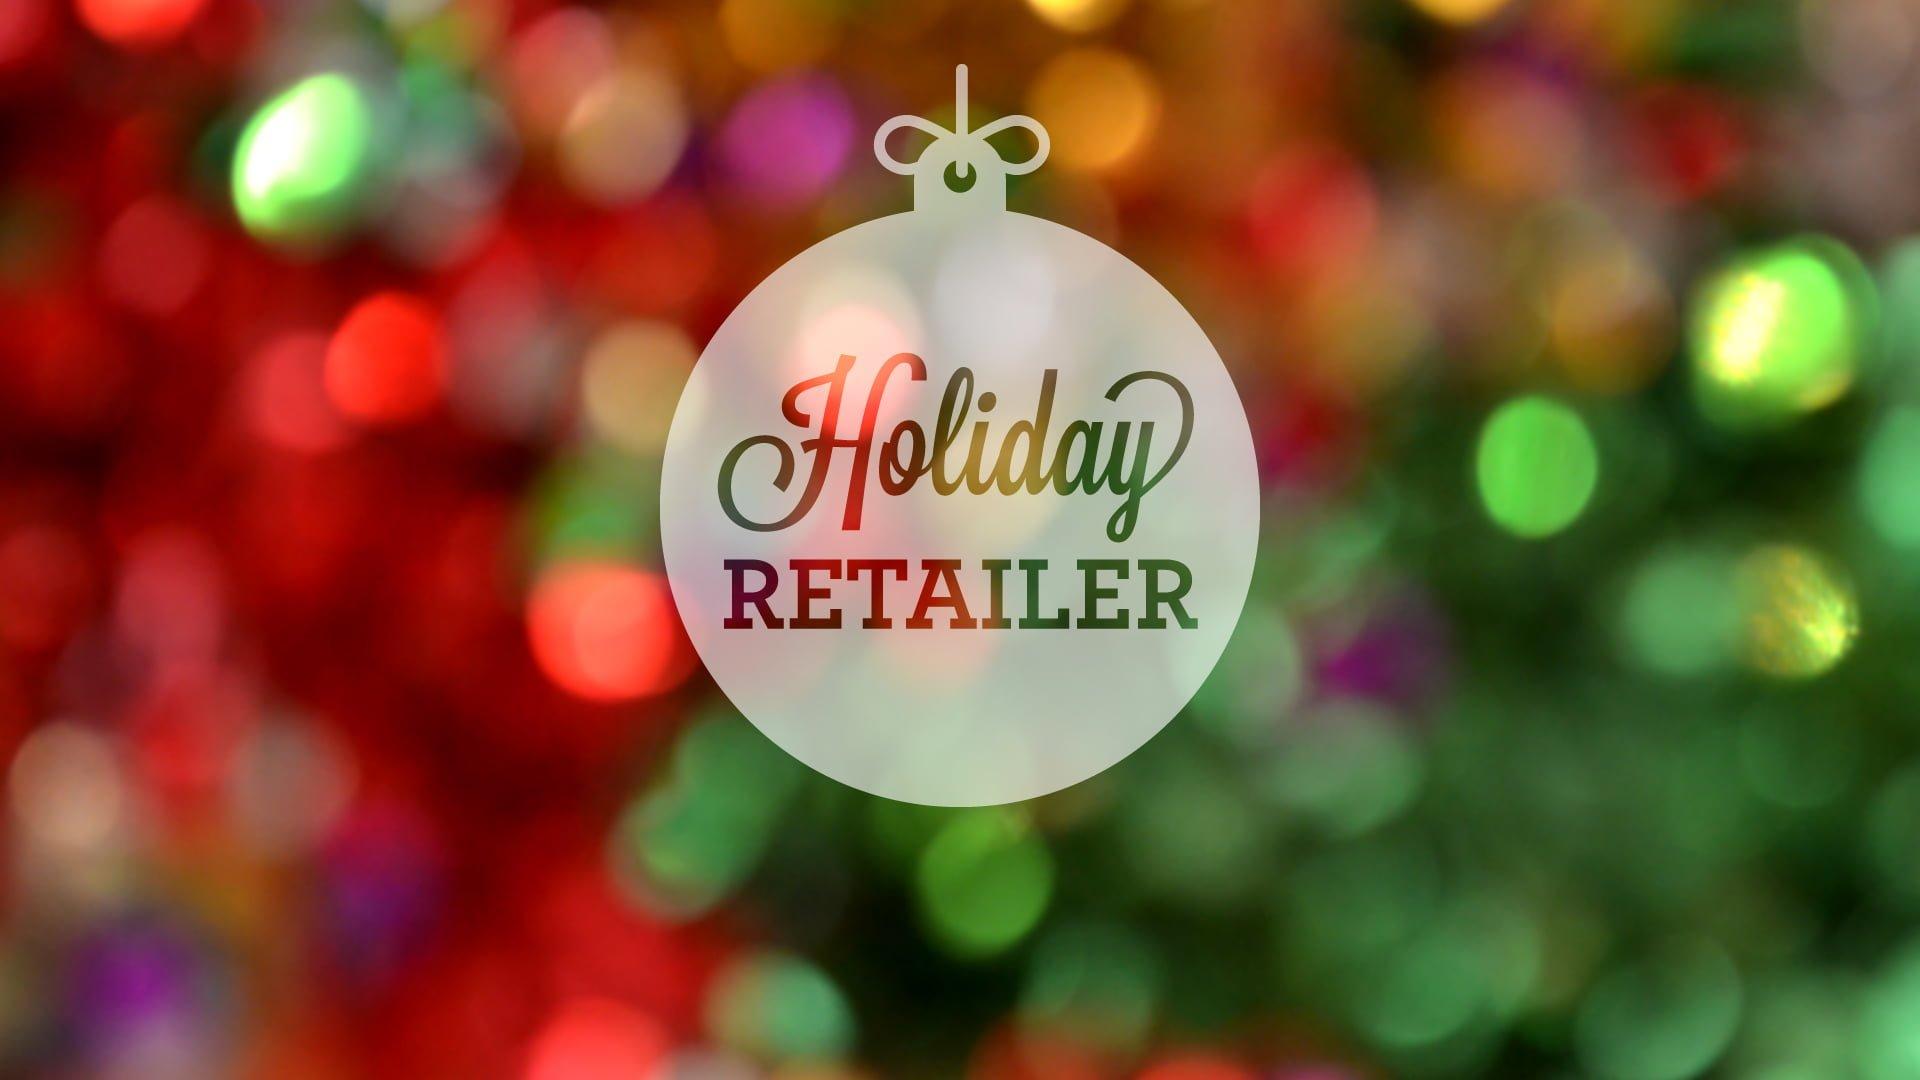 Peloton & Mizzen+Main share their online retail strategies for Black Friday & Cyber Monday